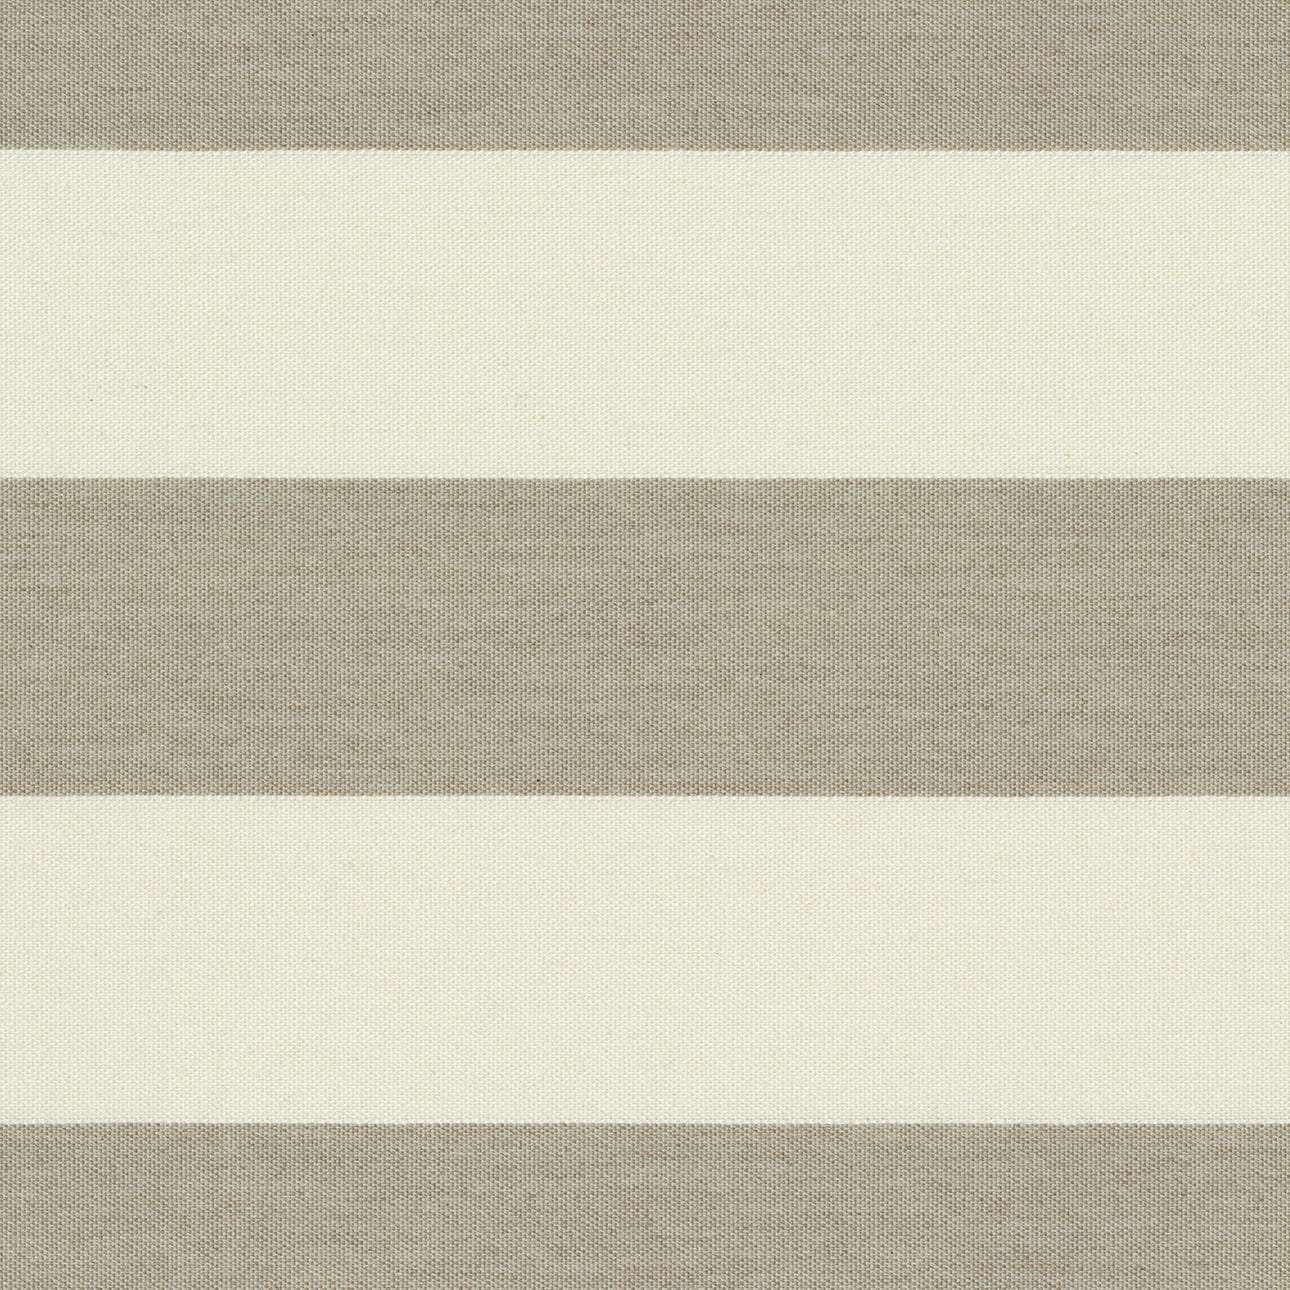 Quadro 142-73 V kolekcii Quadro, tkanina: 142-73